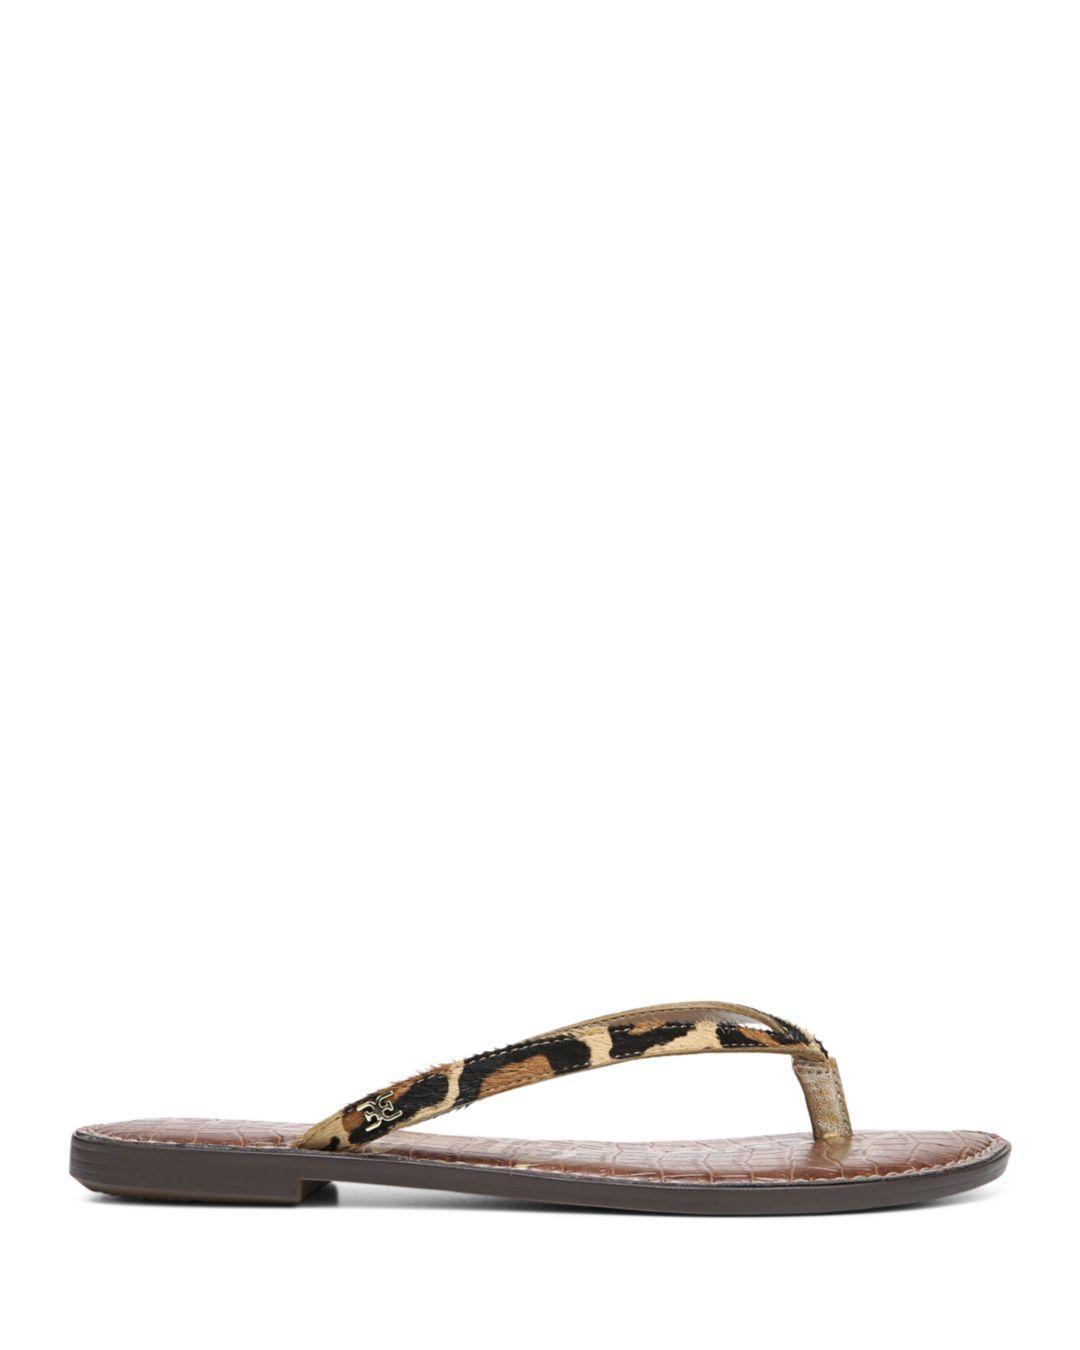 c5060babeb8 Lyst - Sam Edelman Women s Gracie Flip-flops